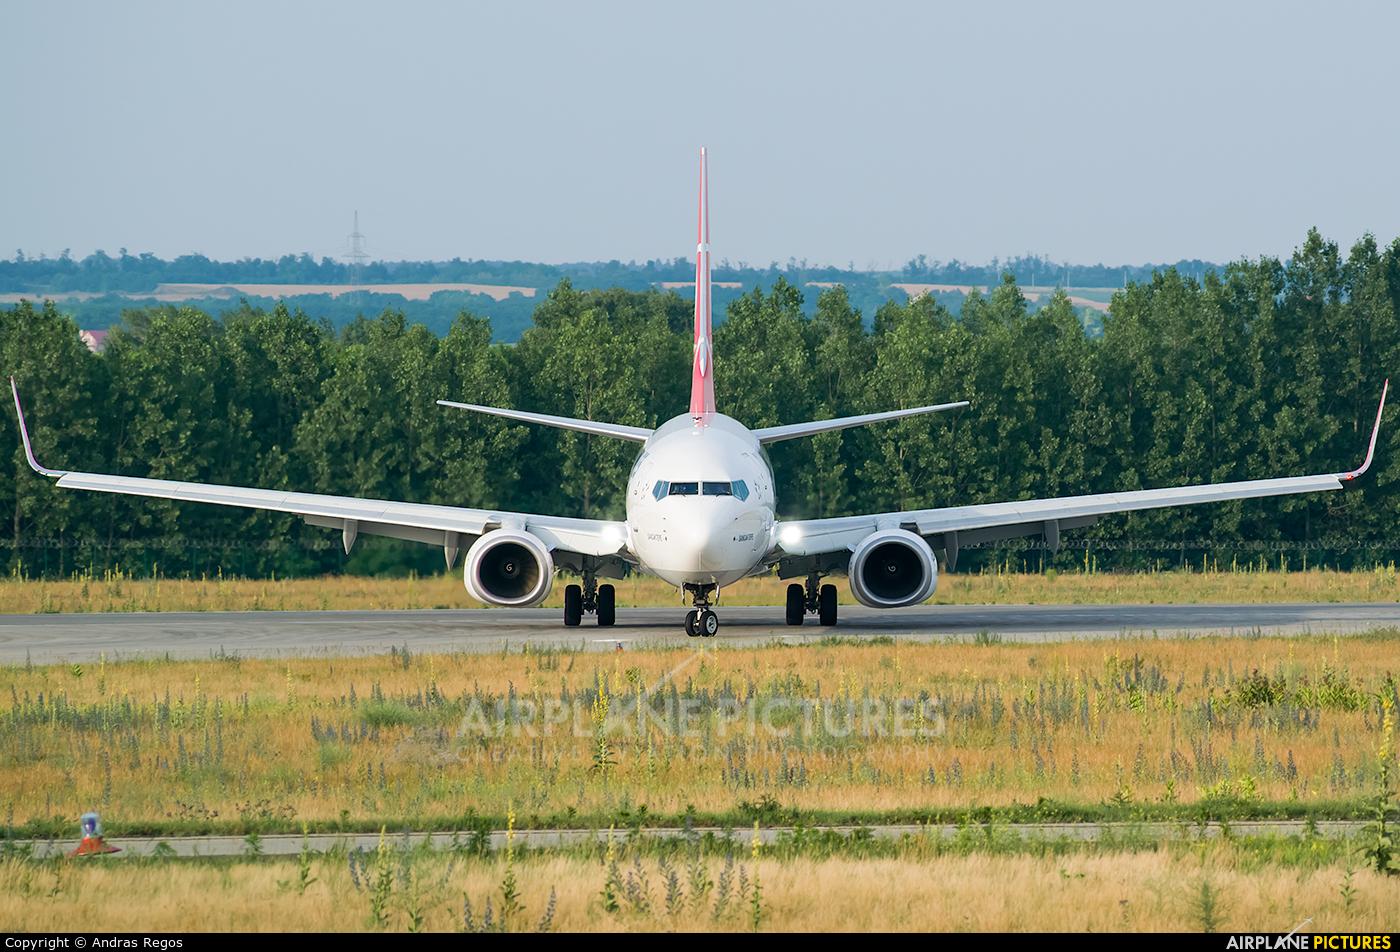 Turkish Airlines TC-JVU aircraft at Budapest Ferenc Liszt International Airport